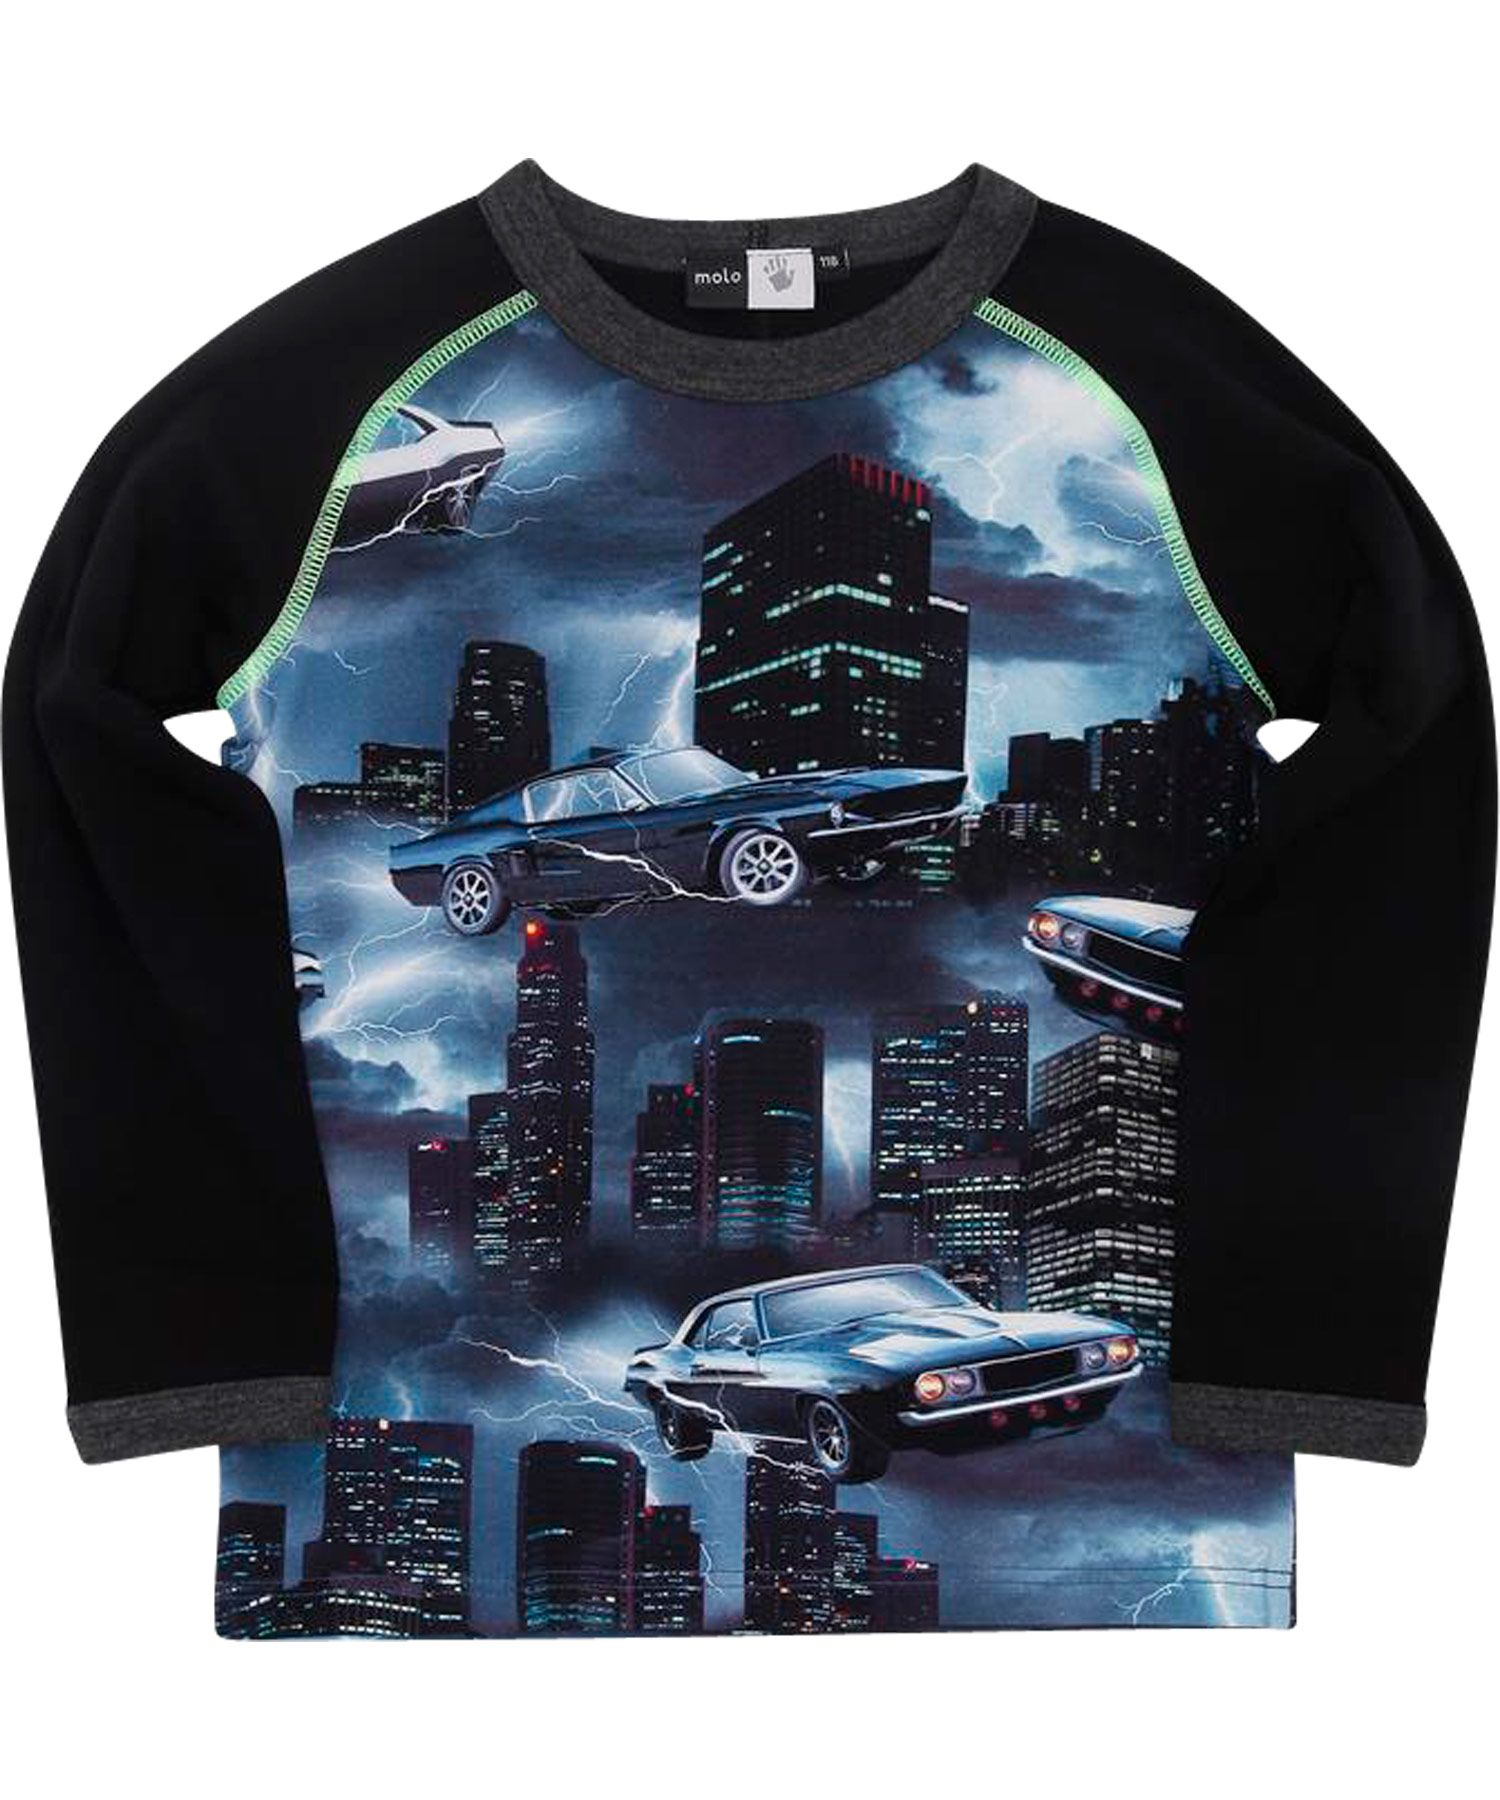 Molo stoere zwarte t-shirt met bliksem auto's. molo.nl.emilea.be